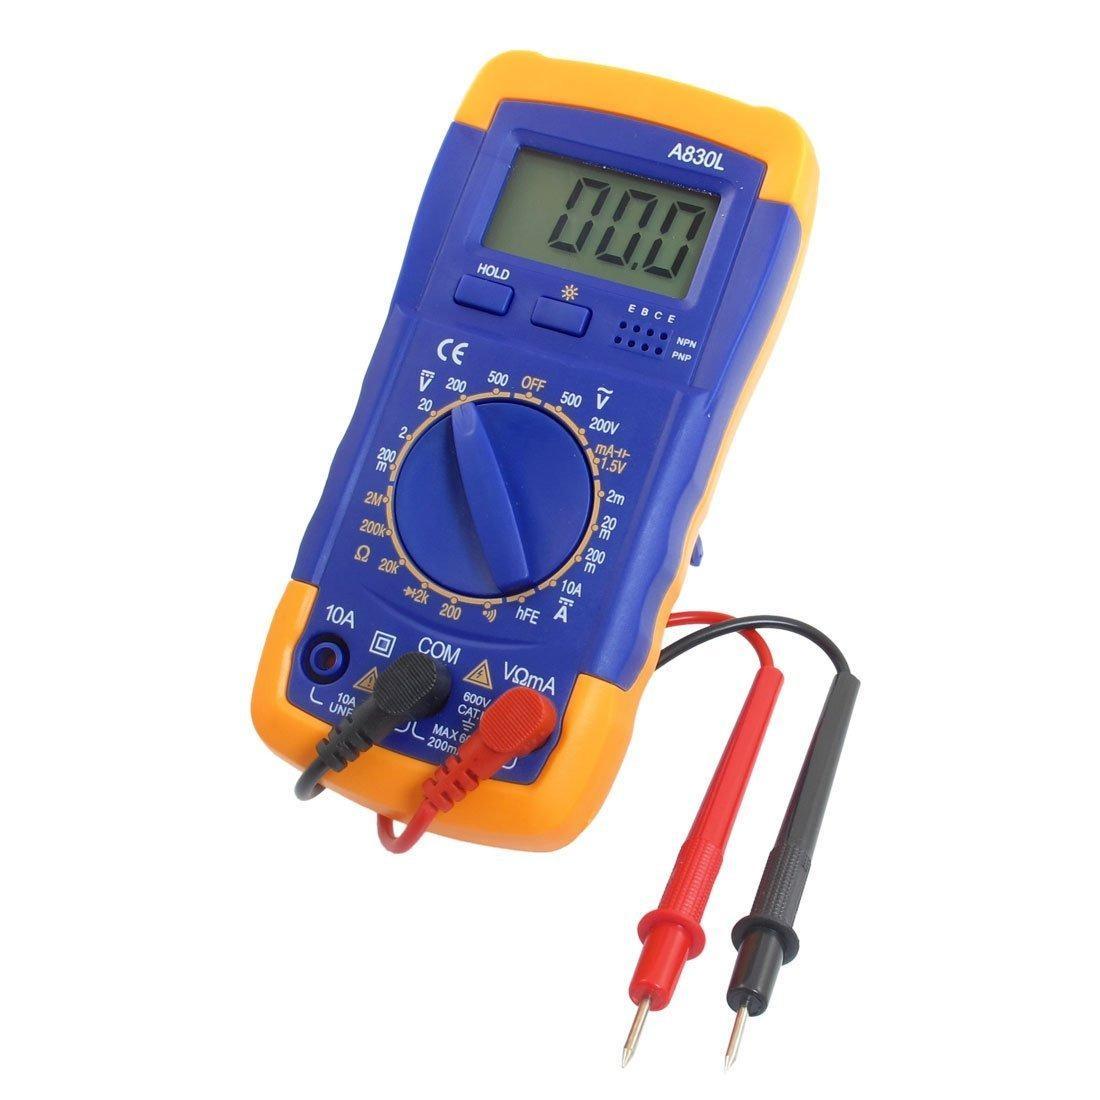 Avometer pocket Digital Multimeter A830L